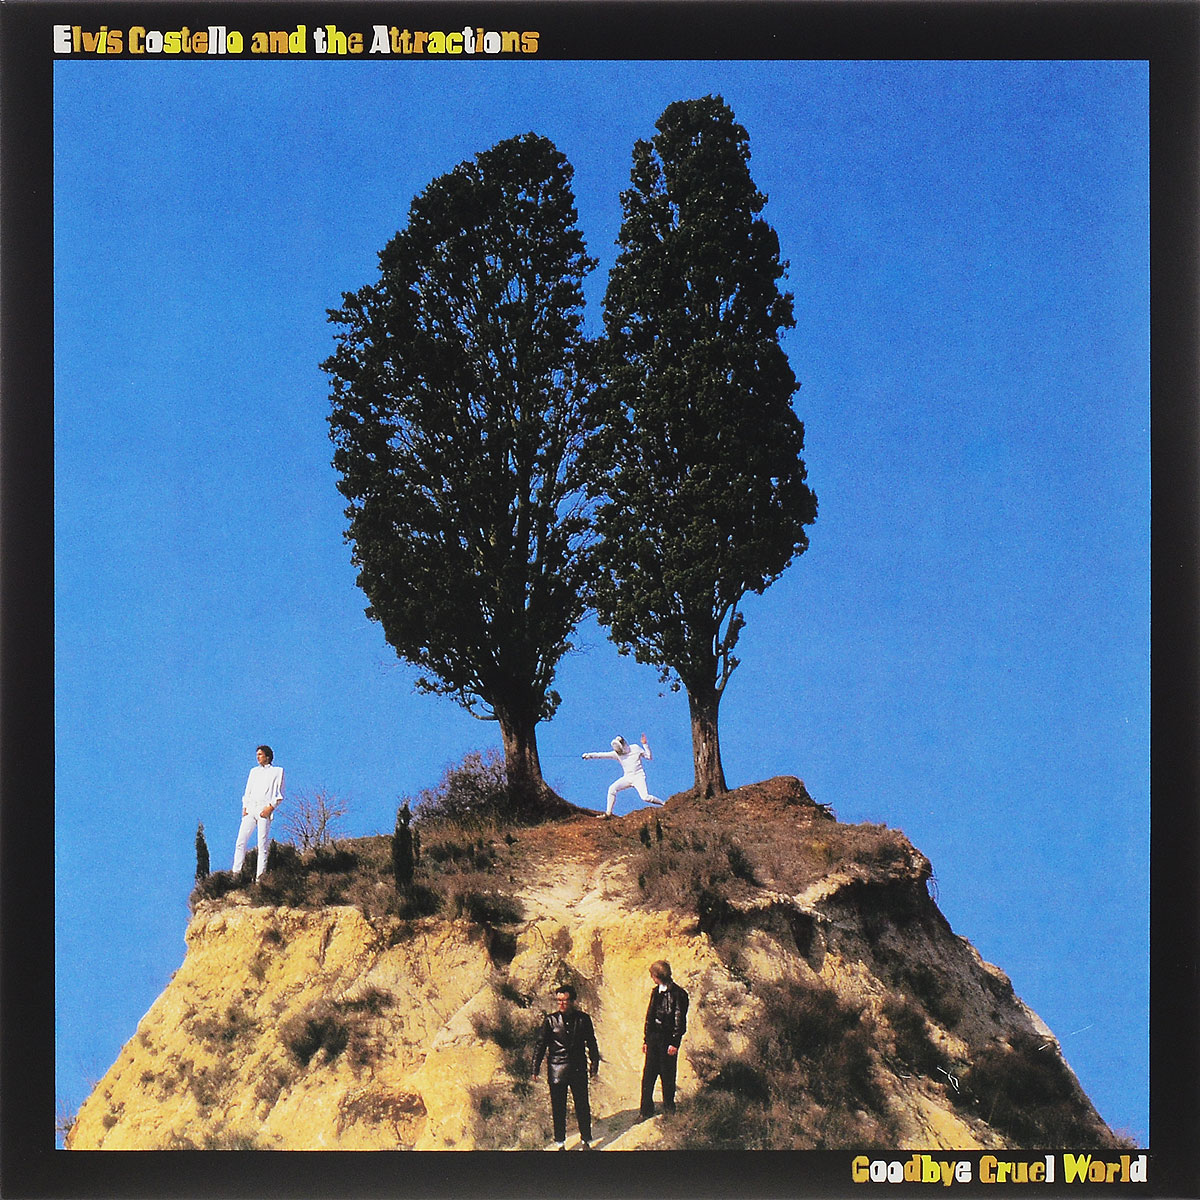 Элвис Костелло,The Attractions Elvis Costello And The Attractions. Goodbye Cruel World (LP) ben harper ben harper welcome to the cruel world lp 7